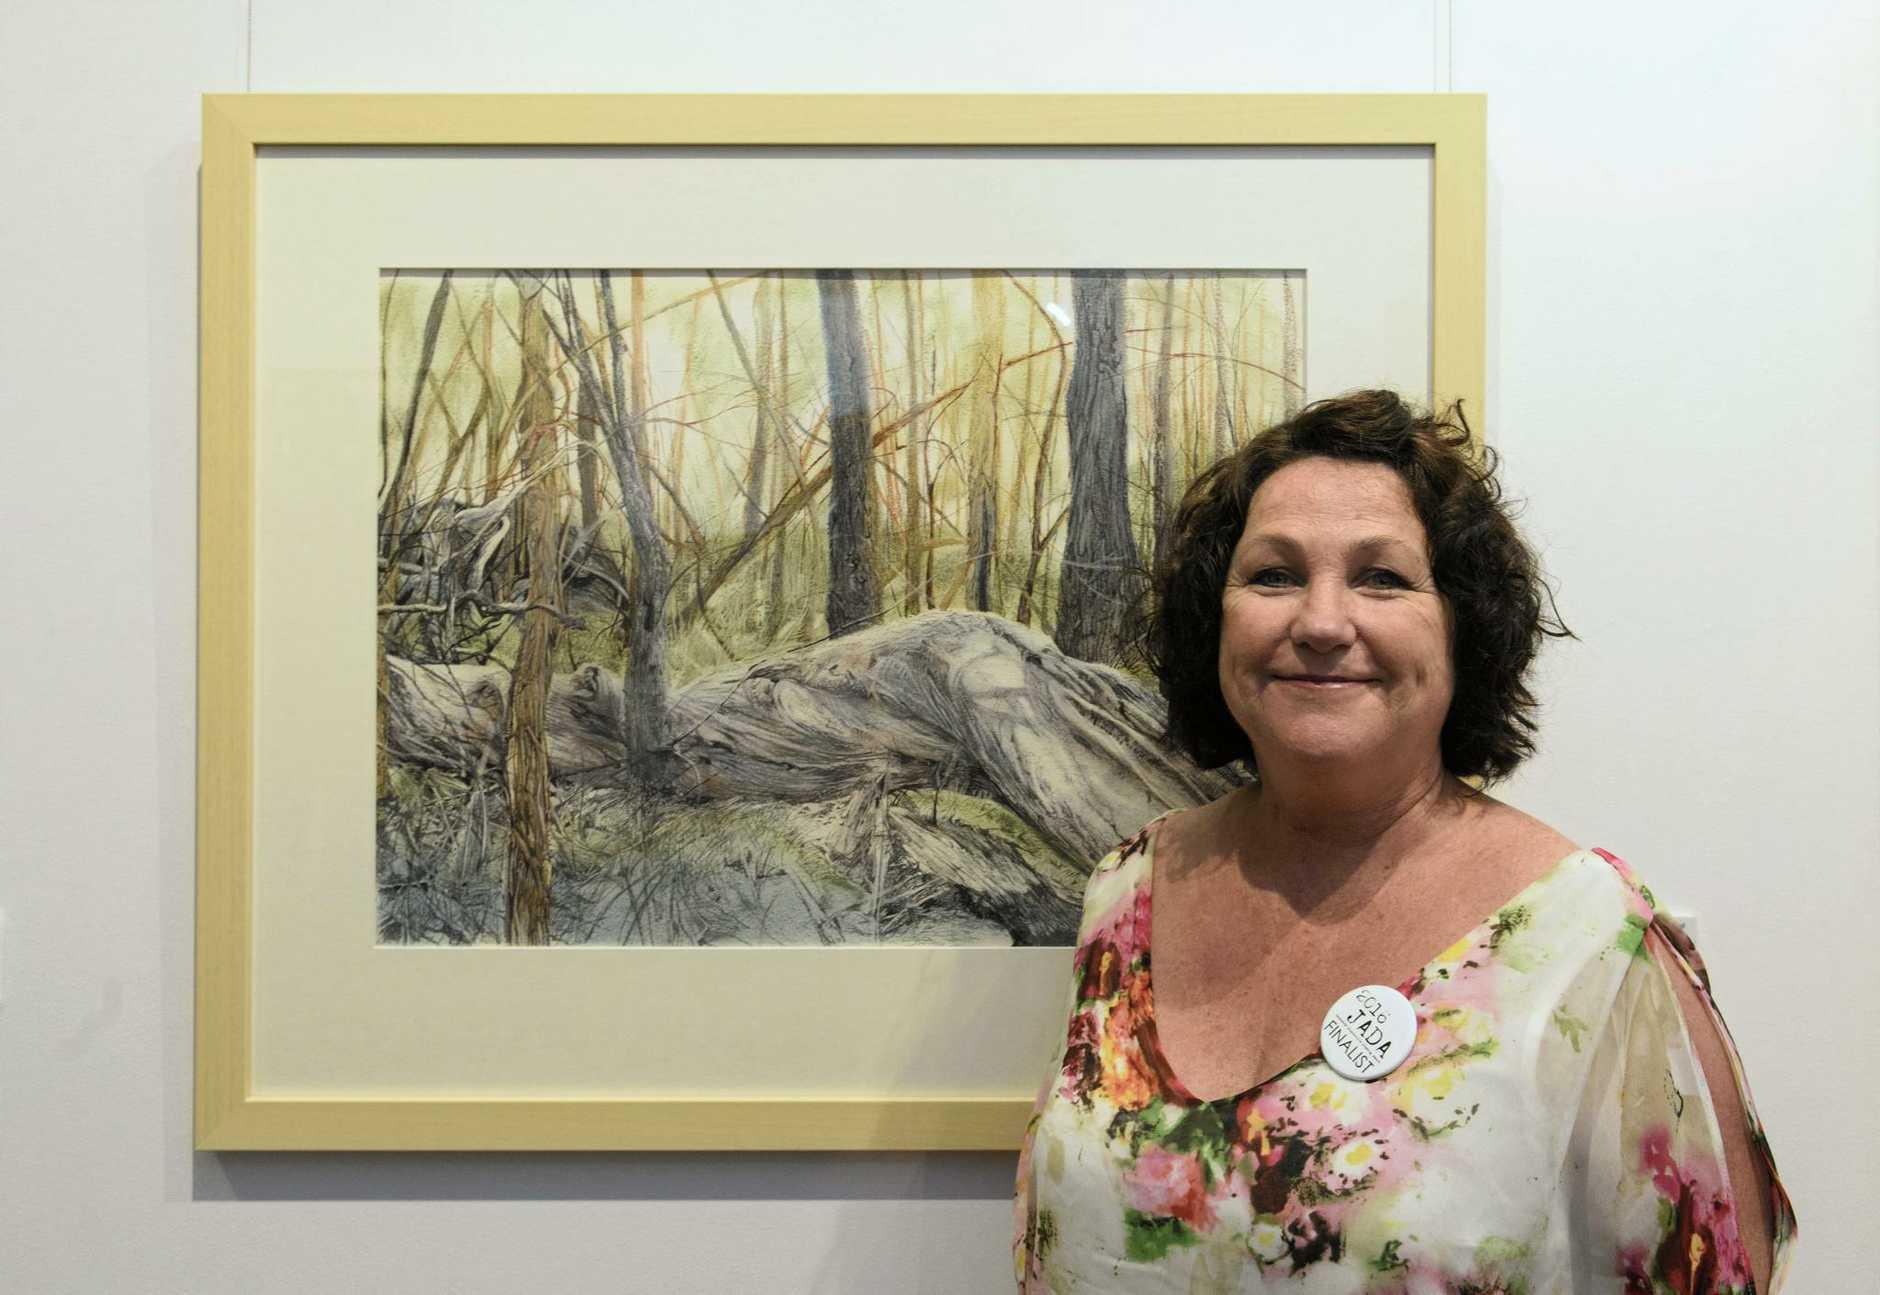 2016 JADA finalist Liz Slater